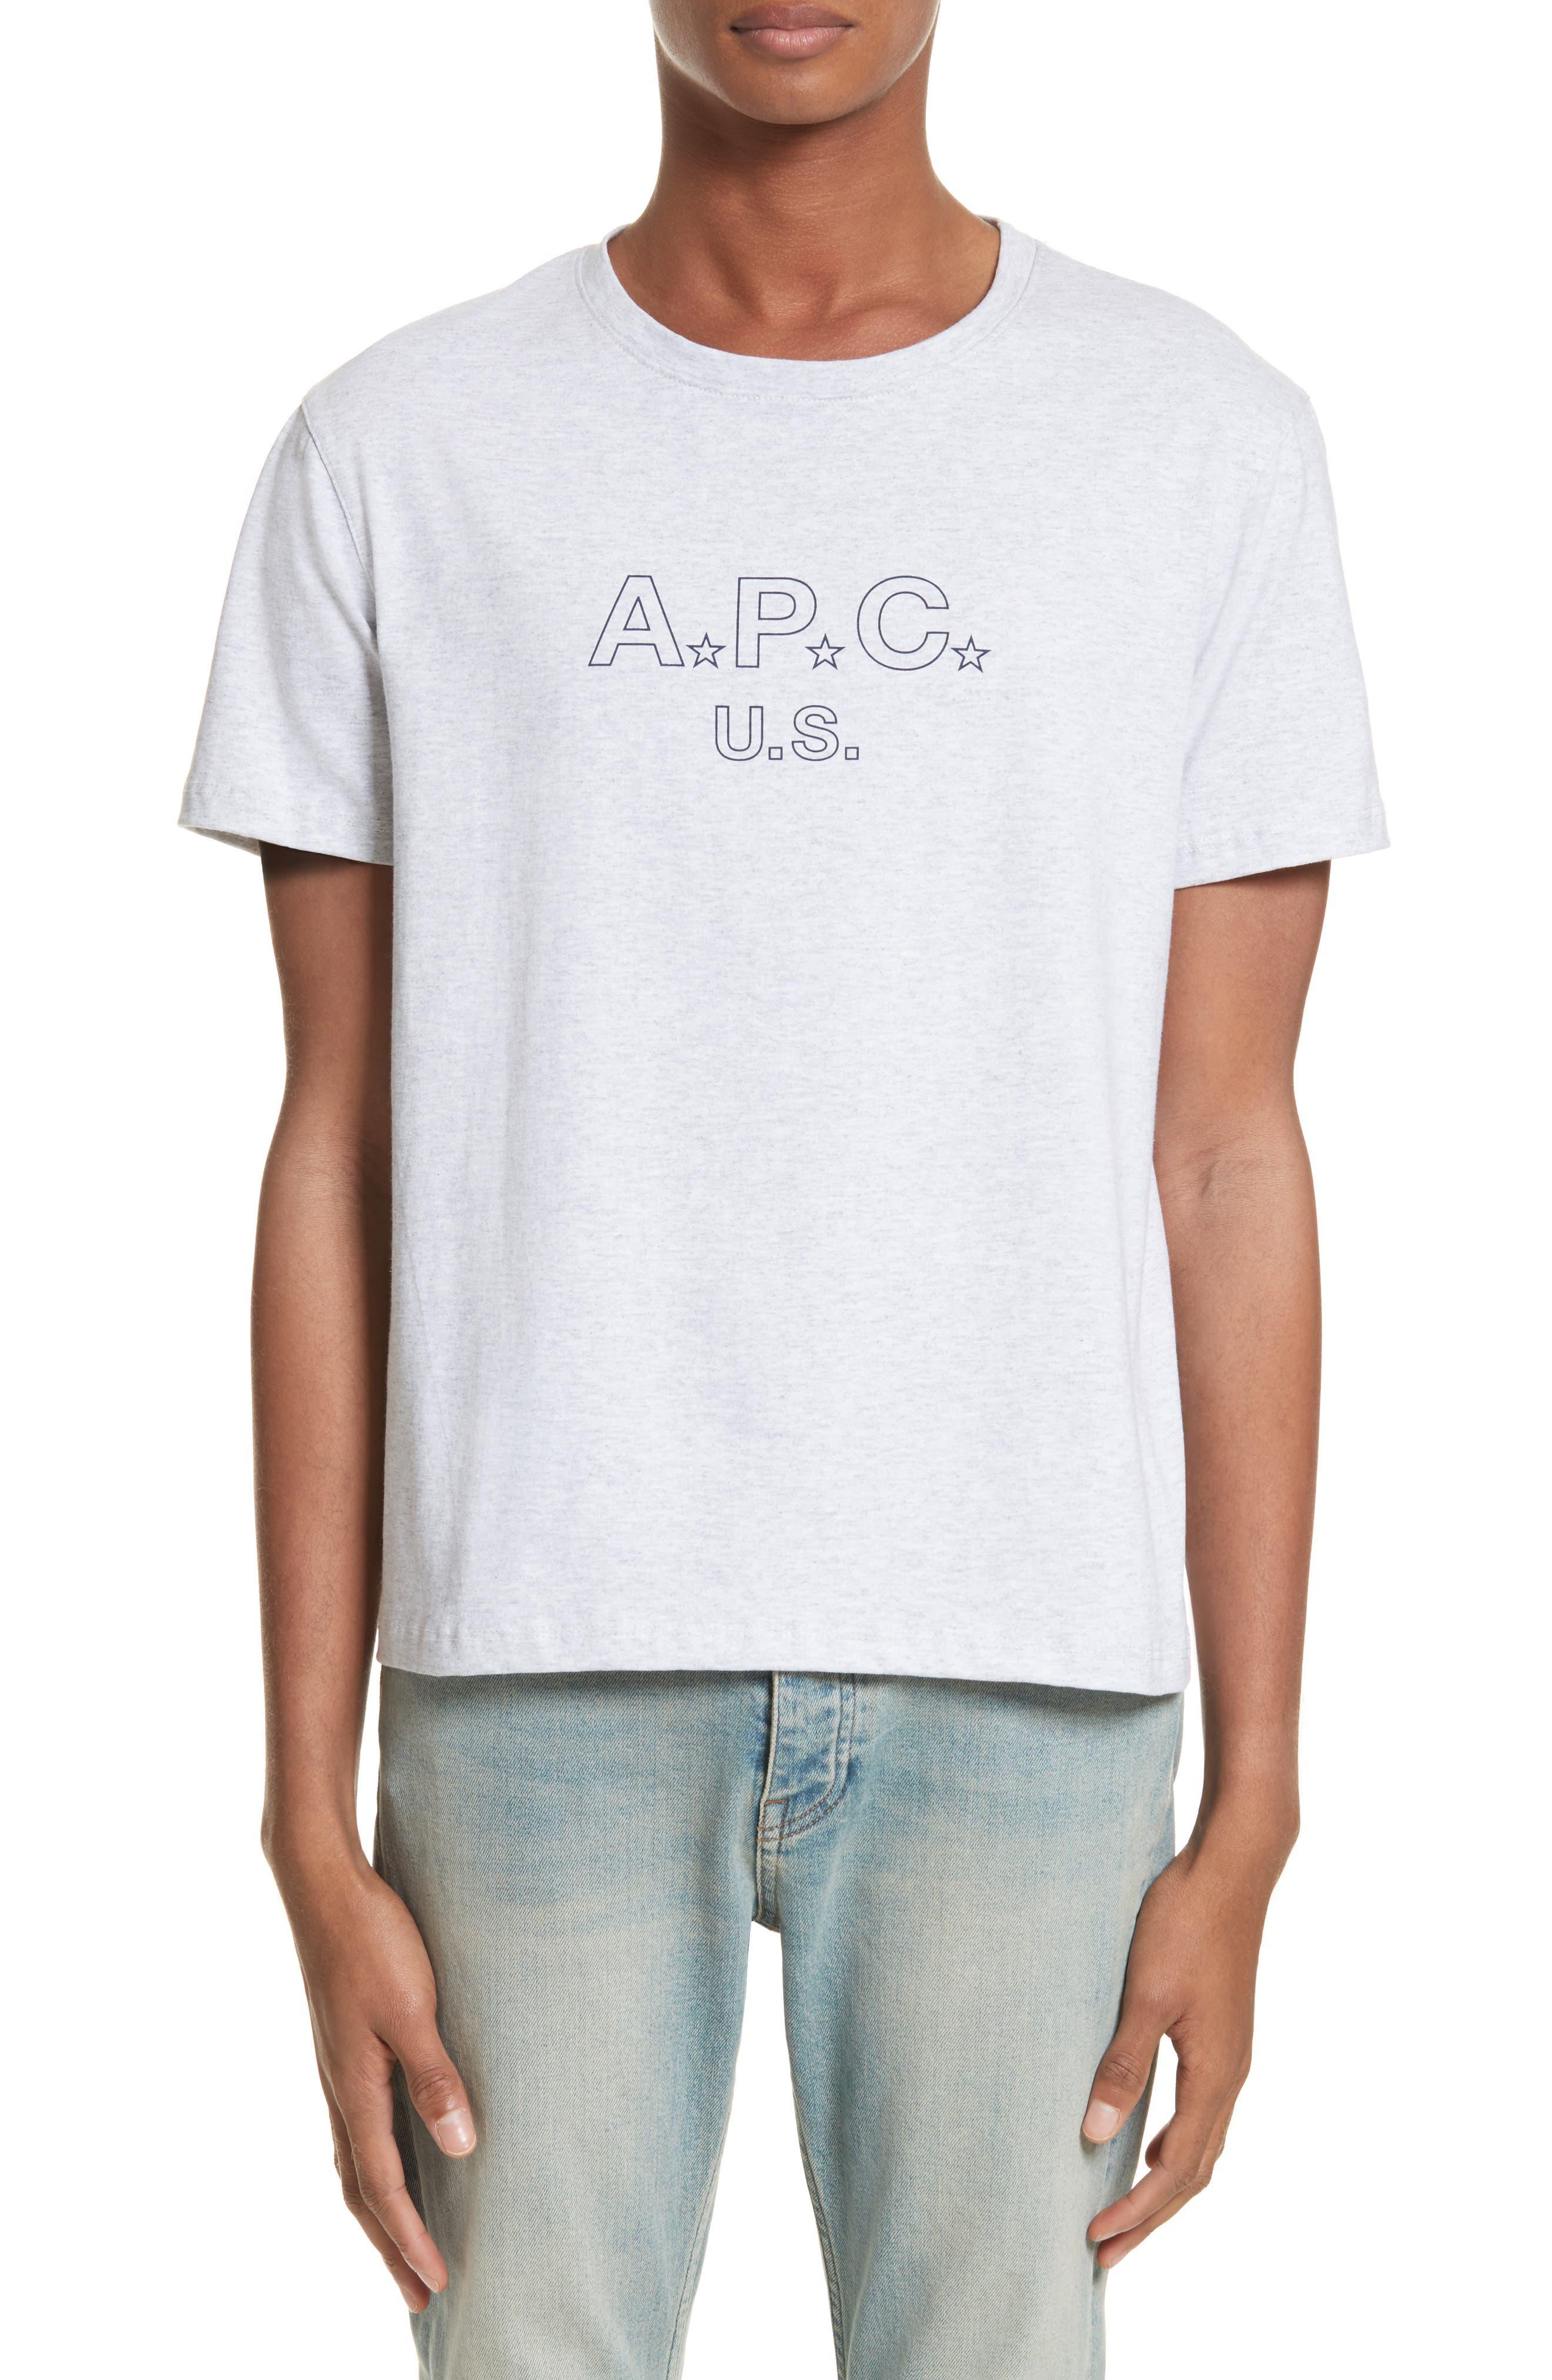 A.P.C. U.S Logo T-Shirt